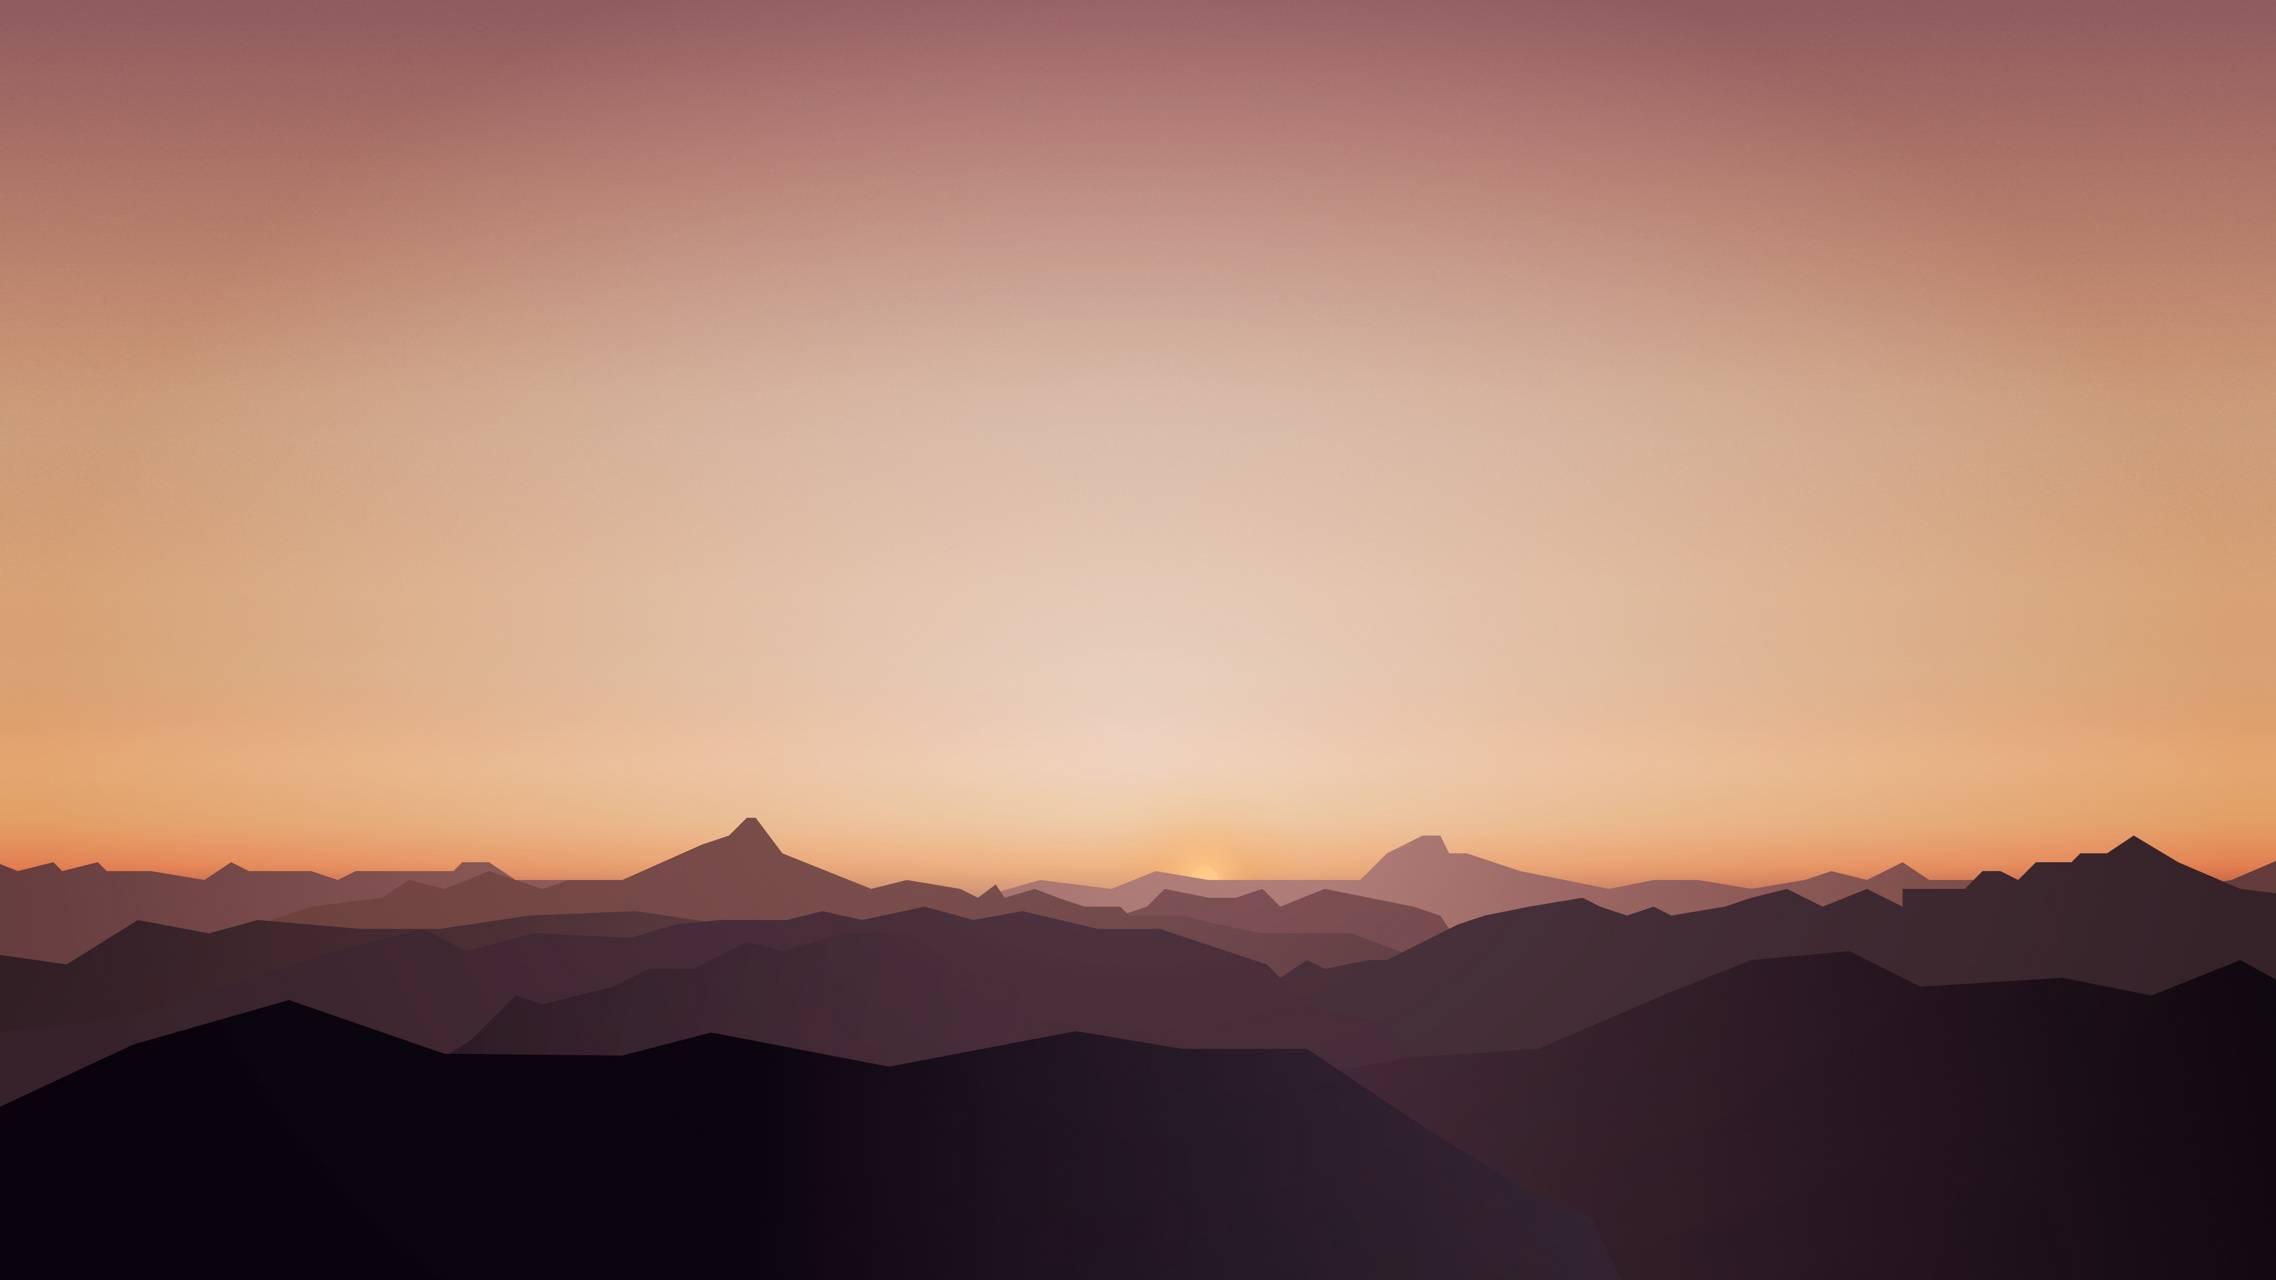 Sleepy Mountains